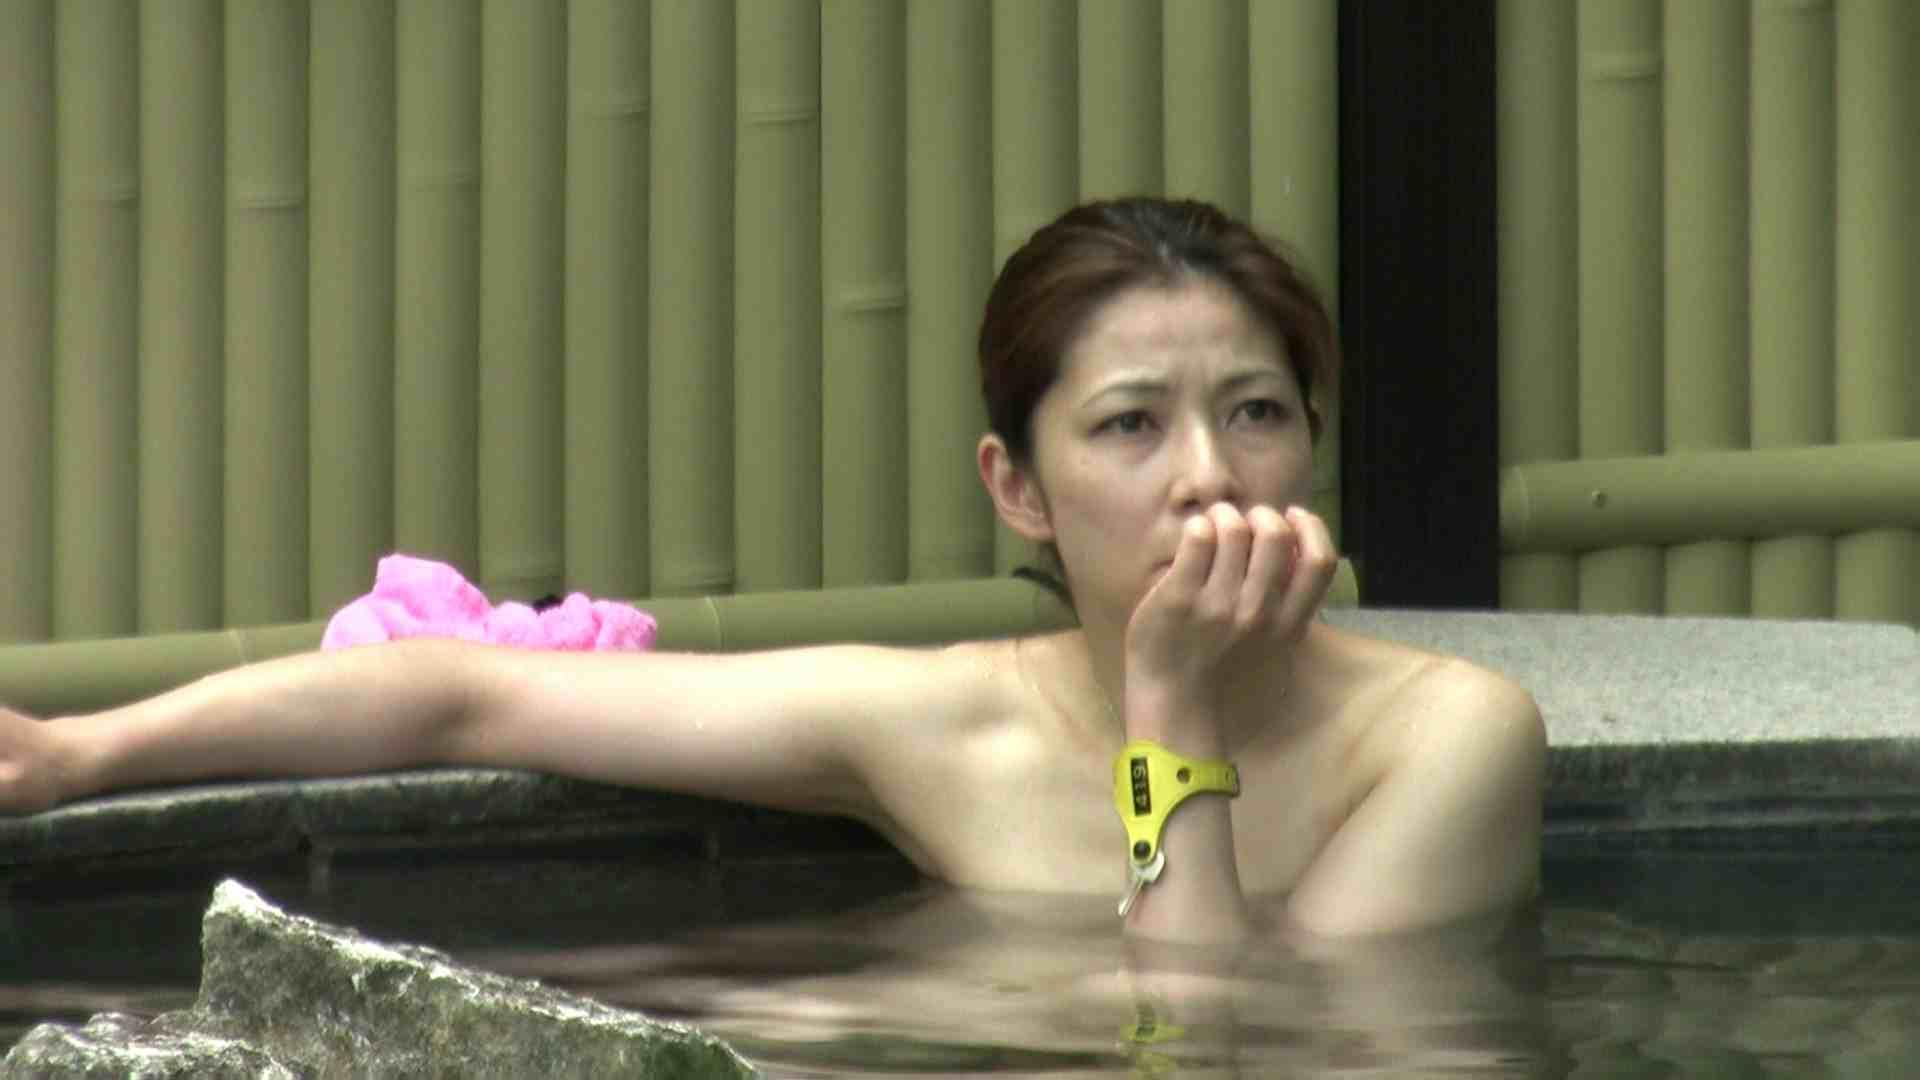 Aquaな露天風呂Vol.660 露天  59連発 27